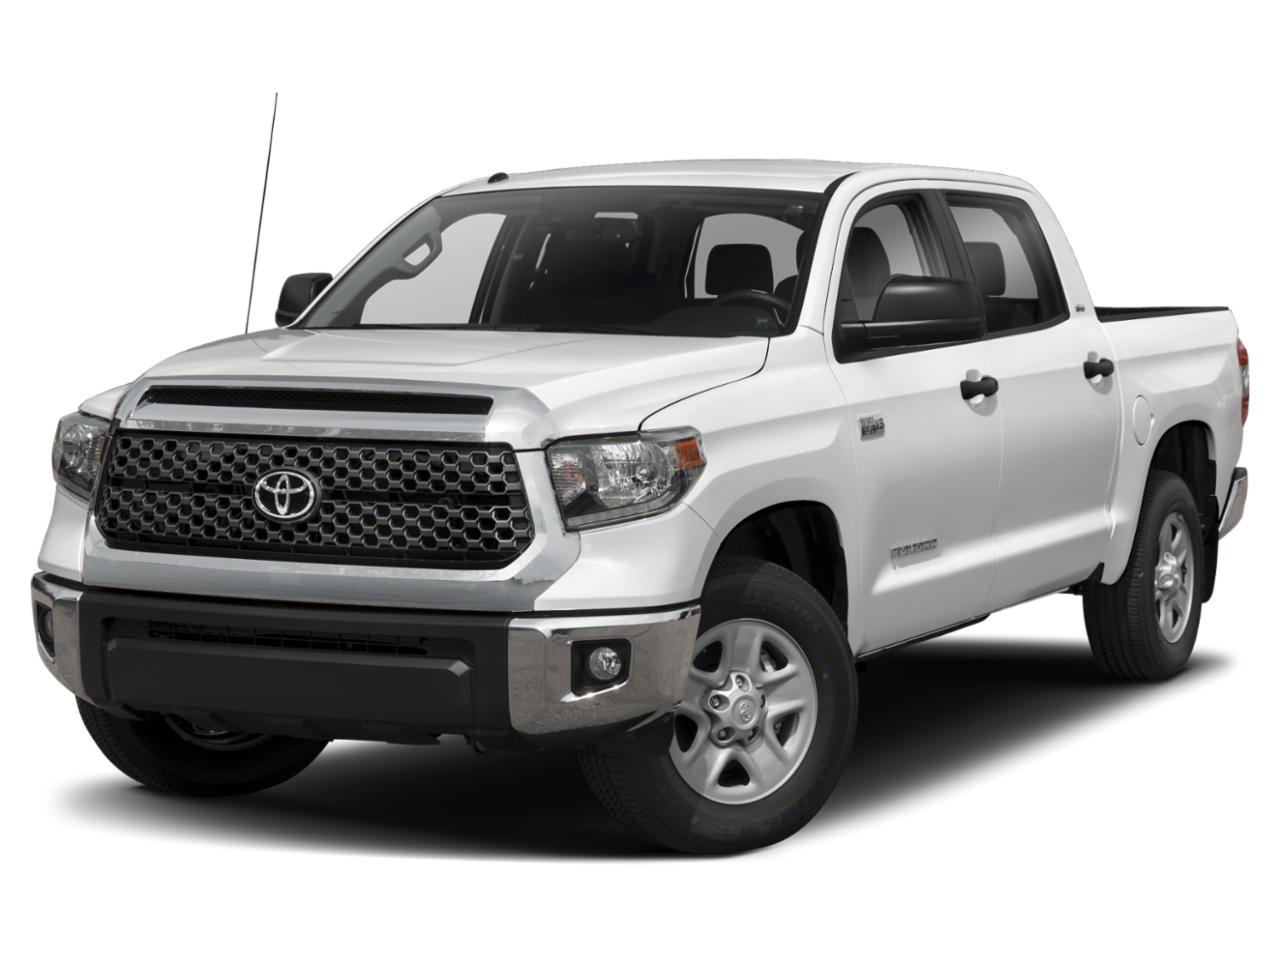 2020 Toyota Tundra 4WD Vehicle Photo in Killeen, TX 76541